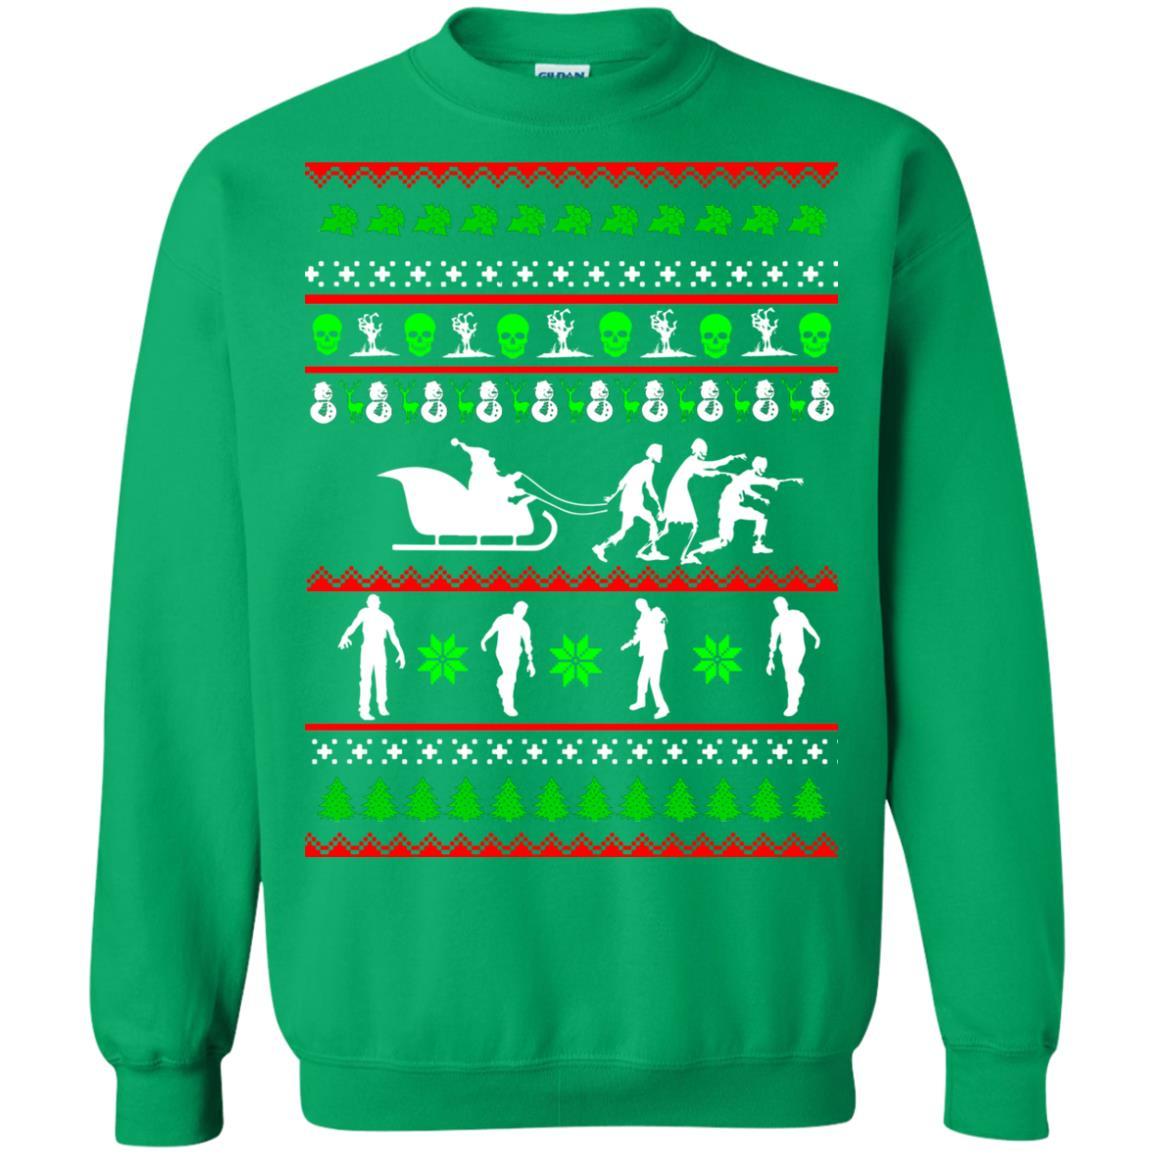 image 5840 - Zombie Christmas Sweater, Hoodie